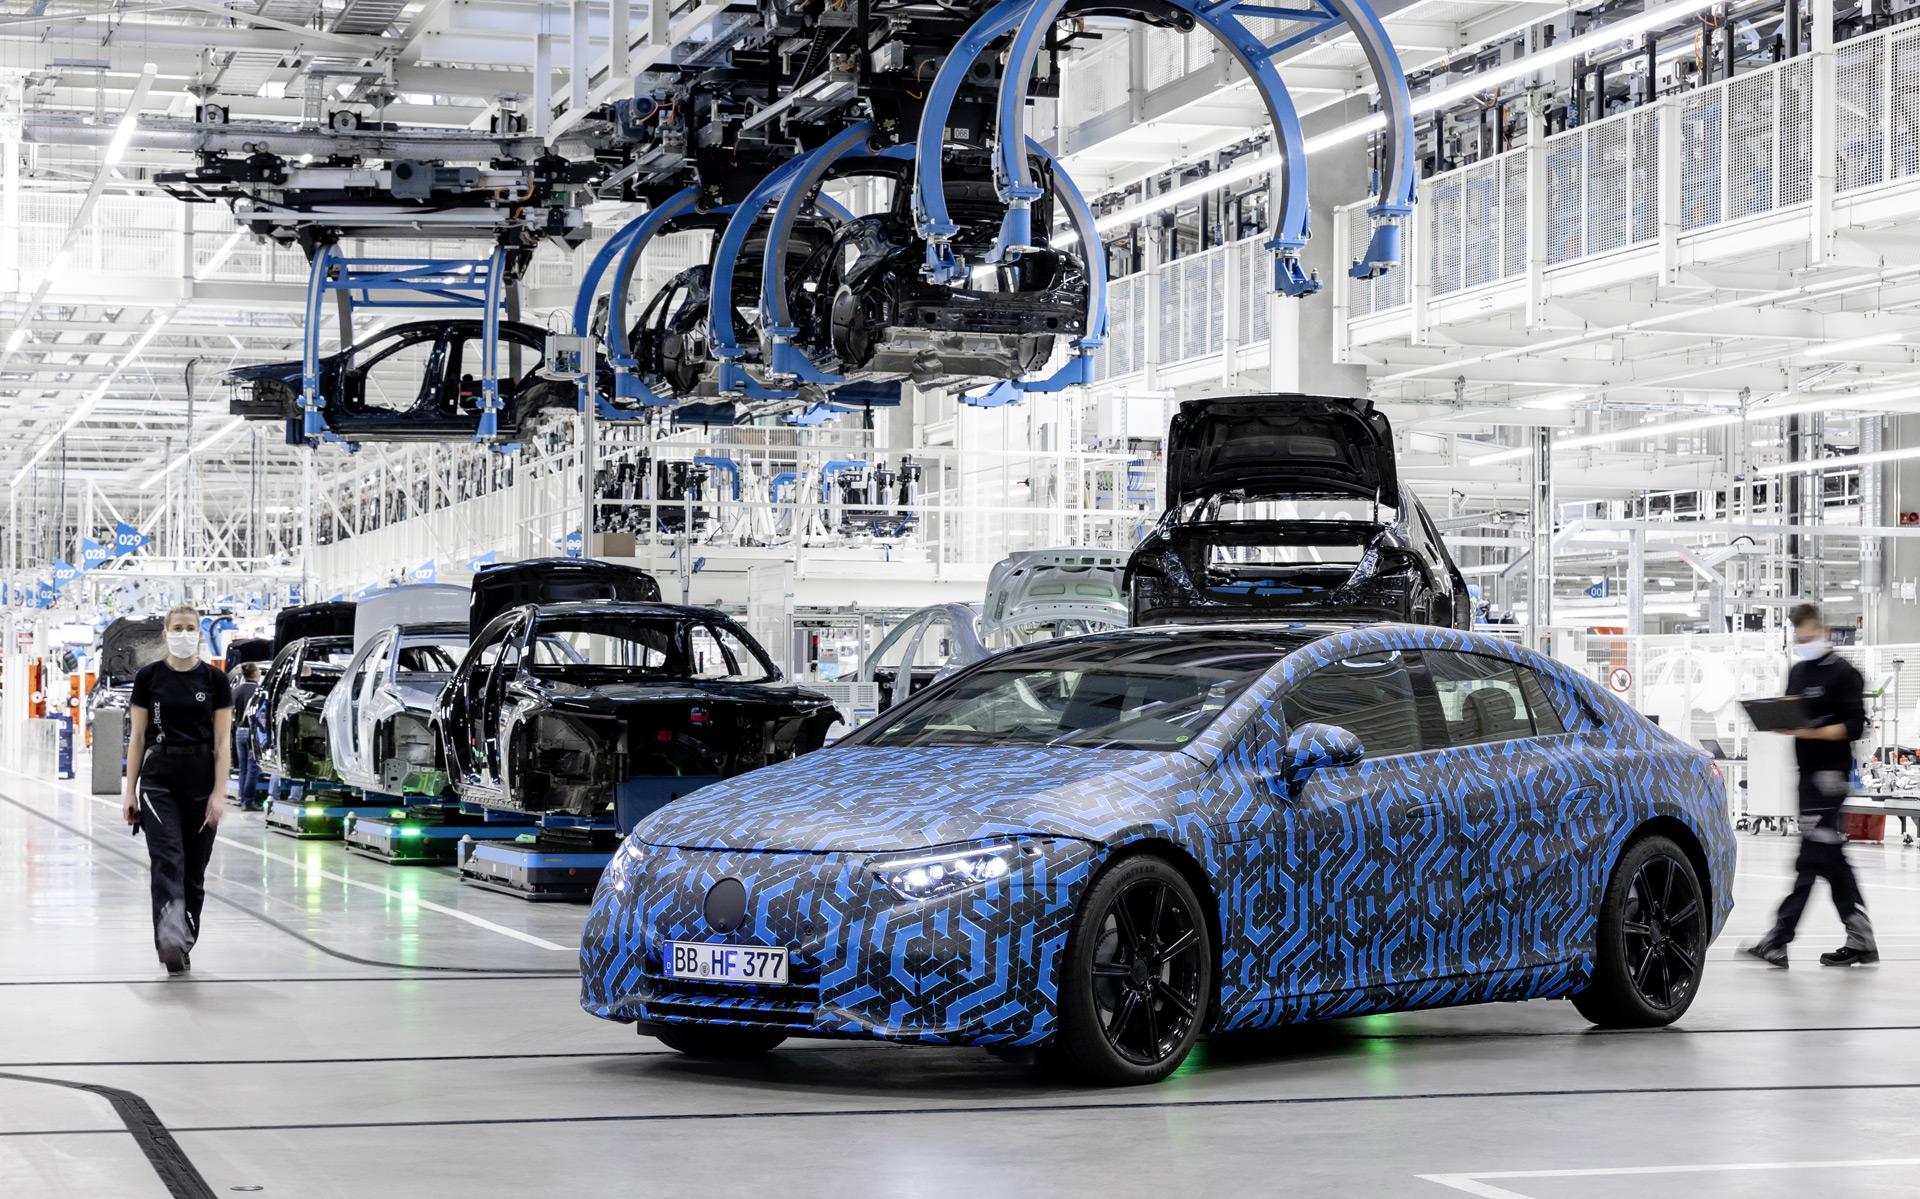 2022 Mercedes Benz Eqs Prototype 100773830 H